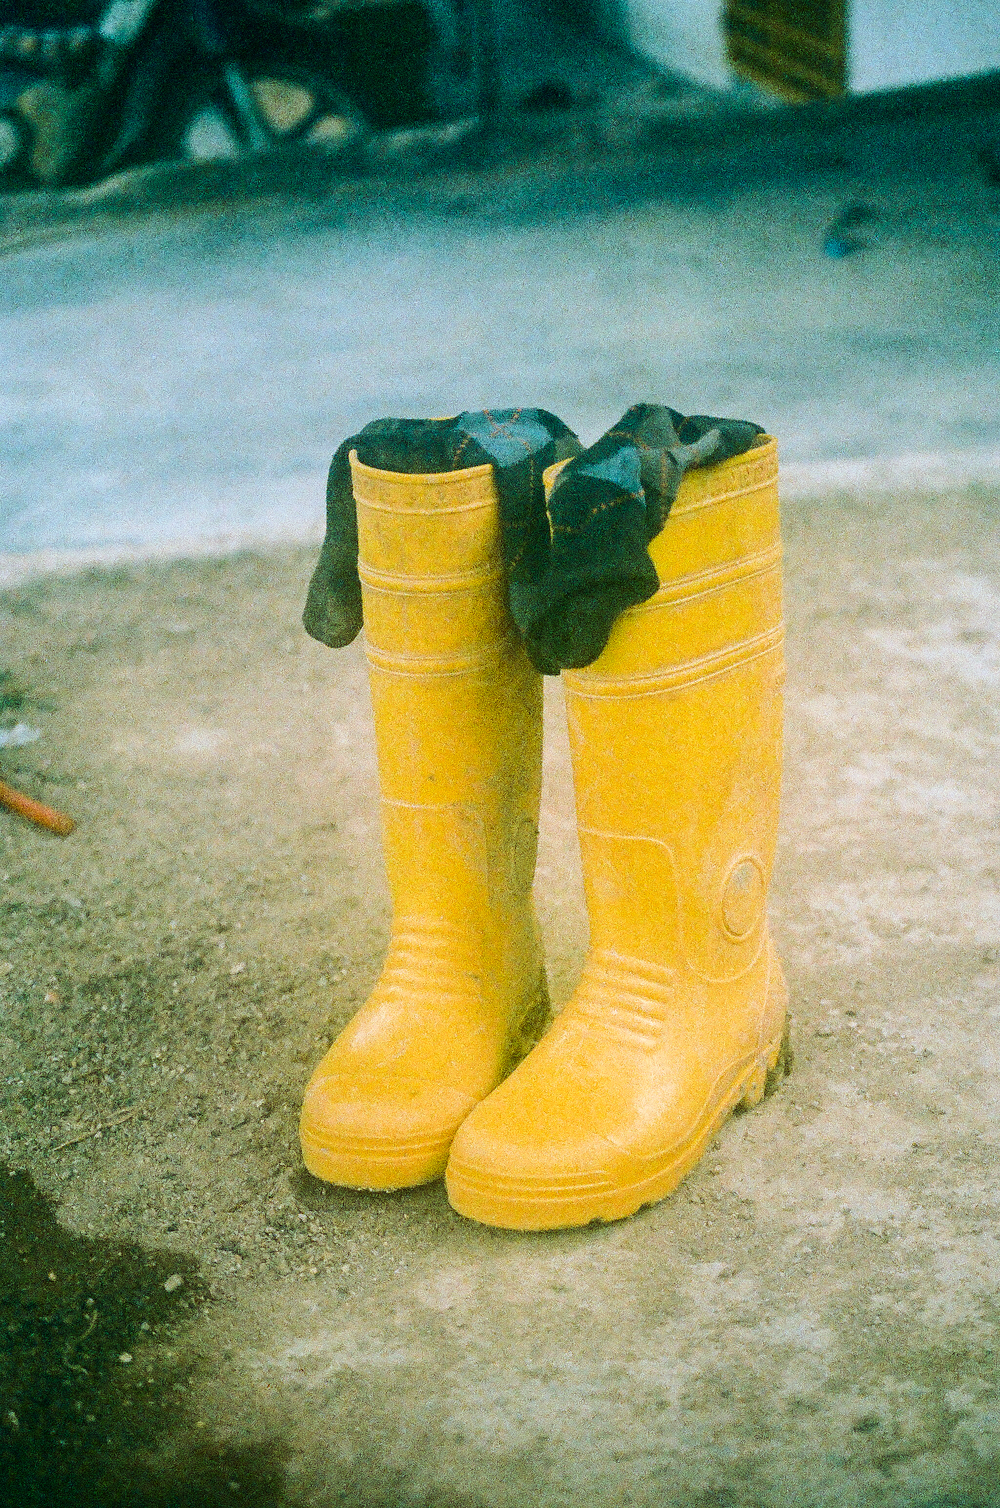 Asia Film Cameron Highlands Farm Boots.jpg